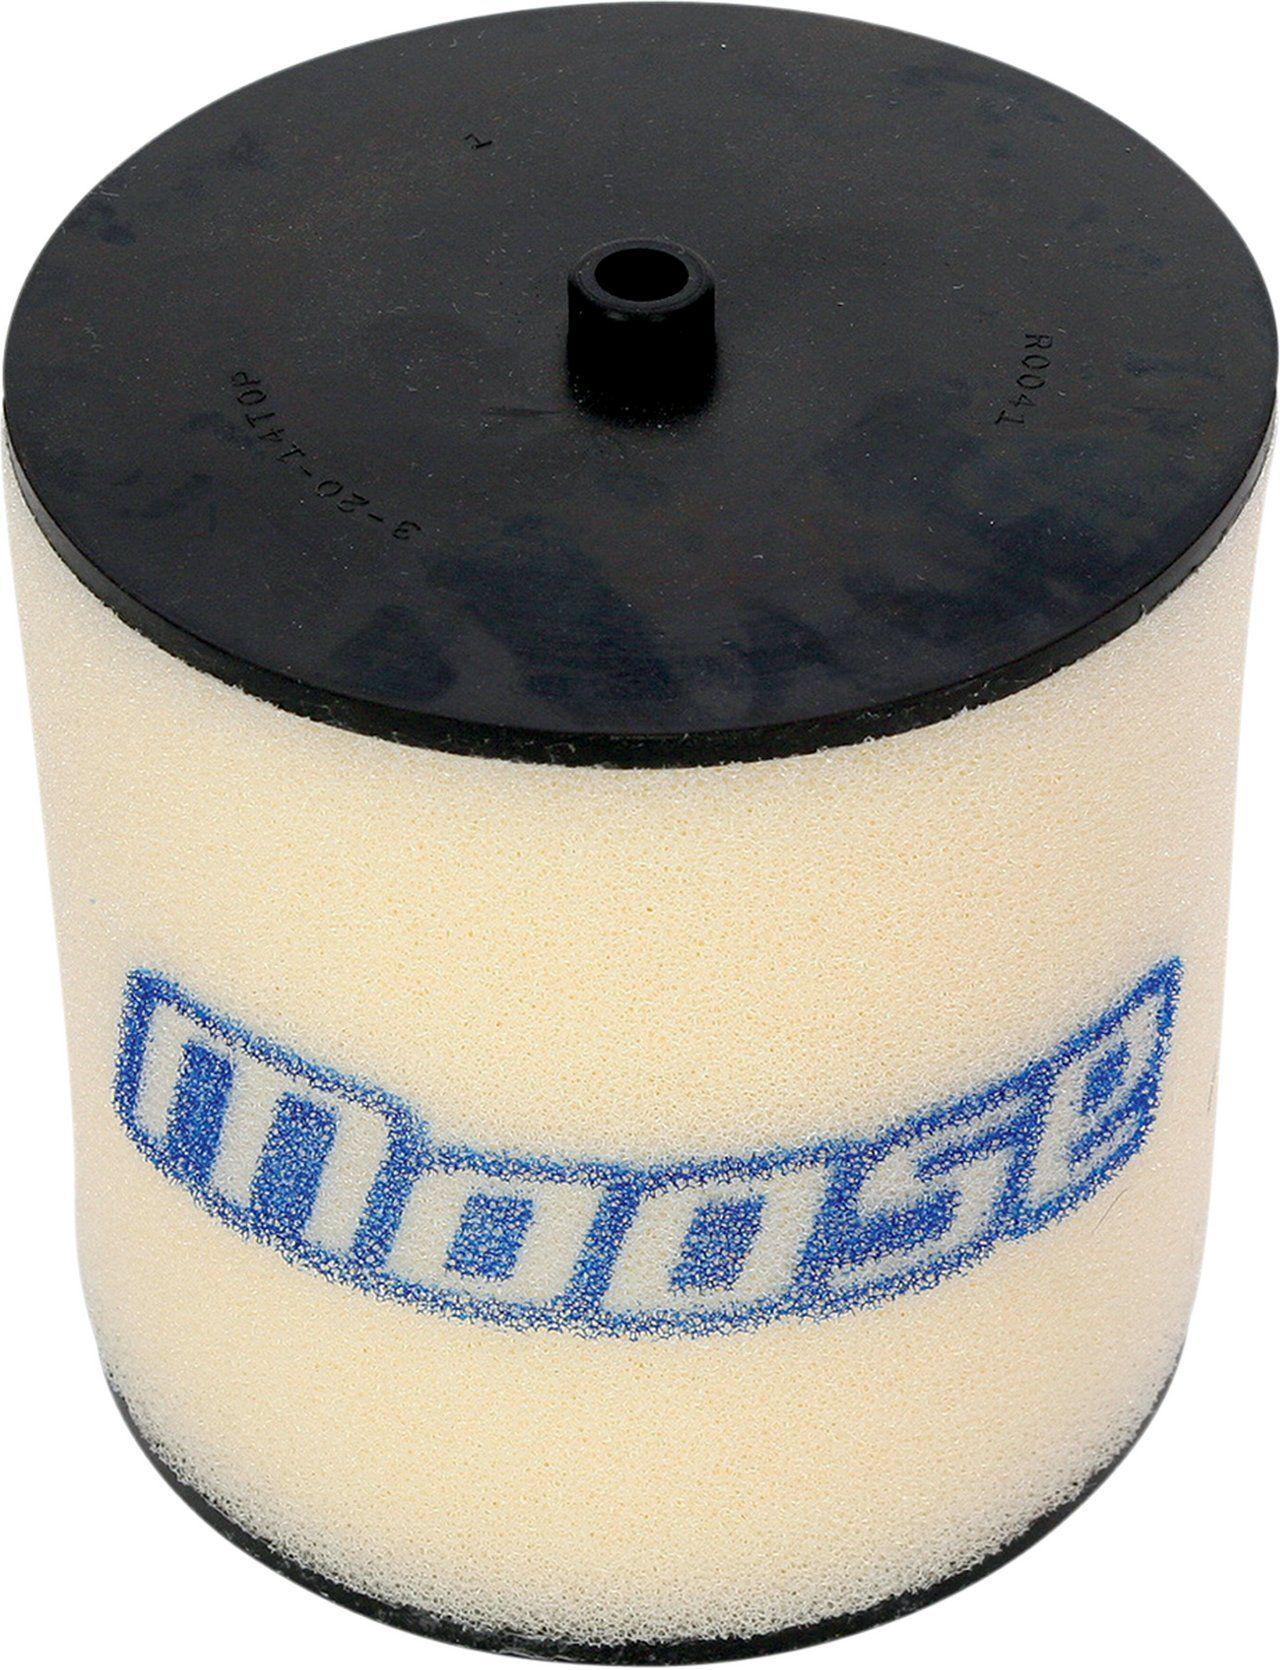 【MOOSE RACING】PPO (PRECISION PRE-OILED) 空氣濾芯 [M763-20-14] - 「Webike-摩托百貨」